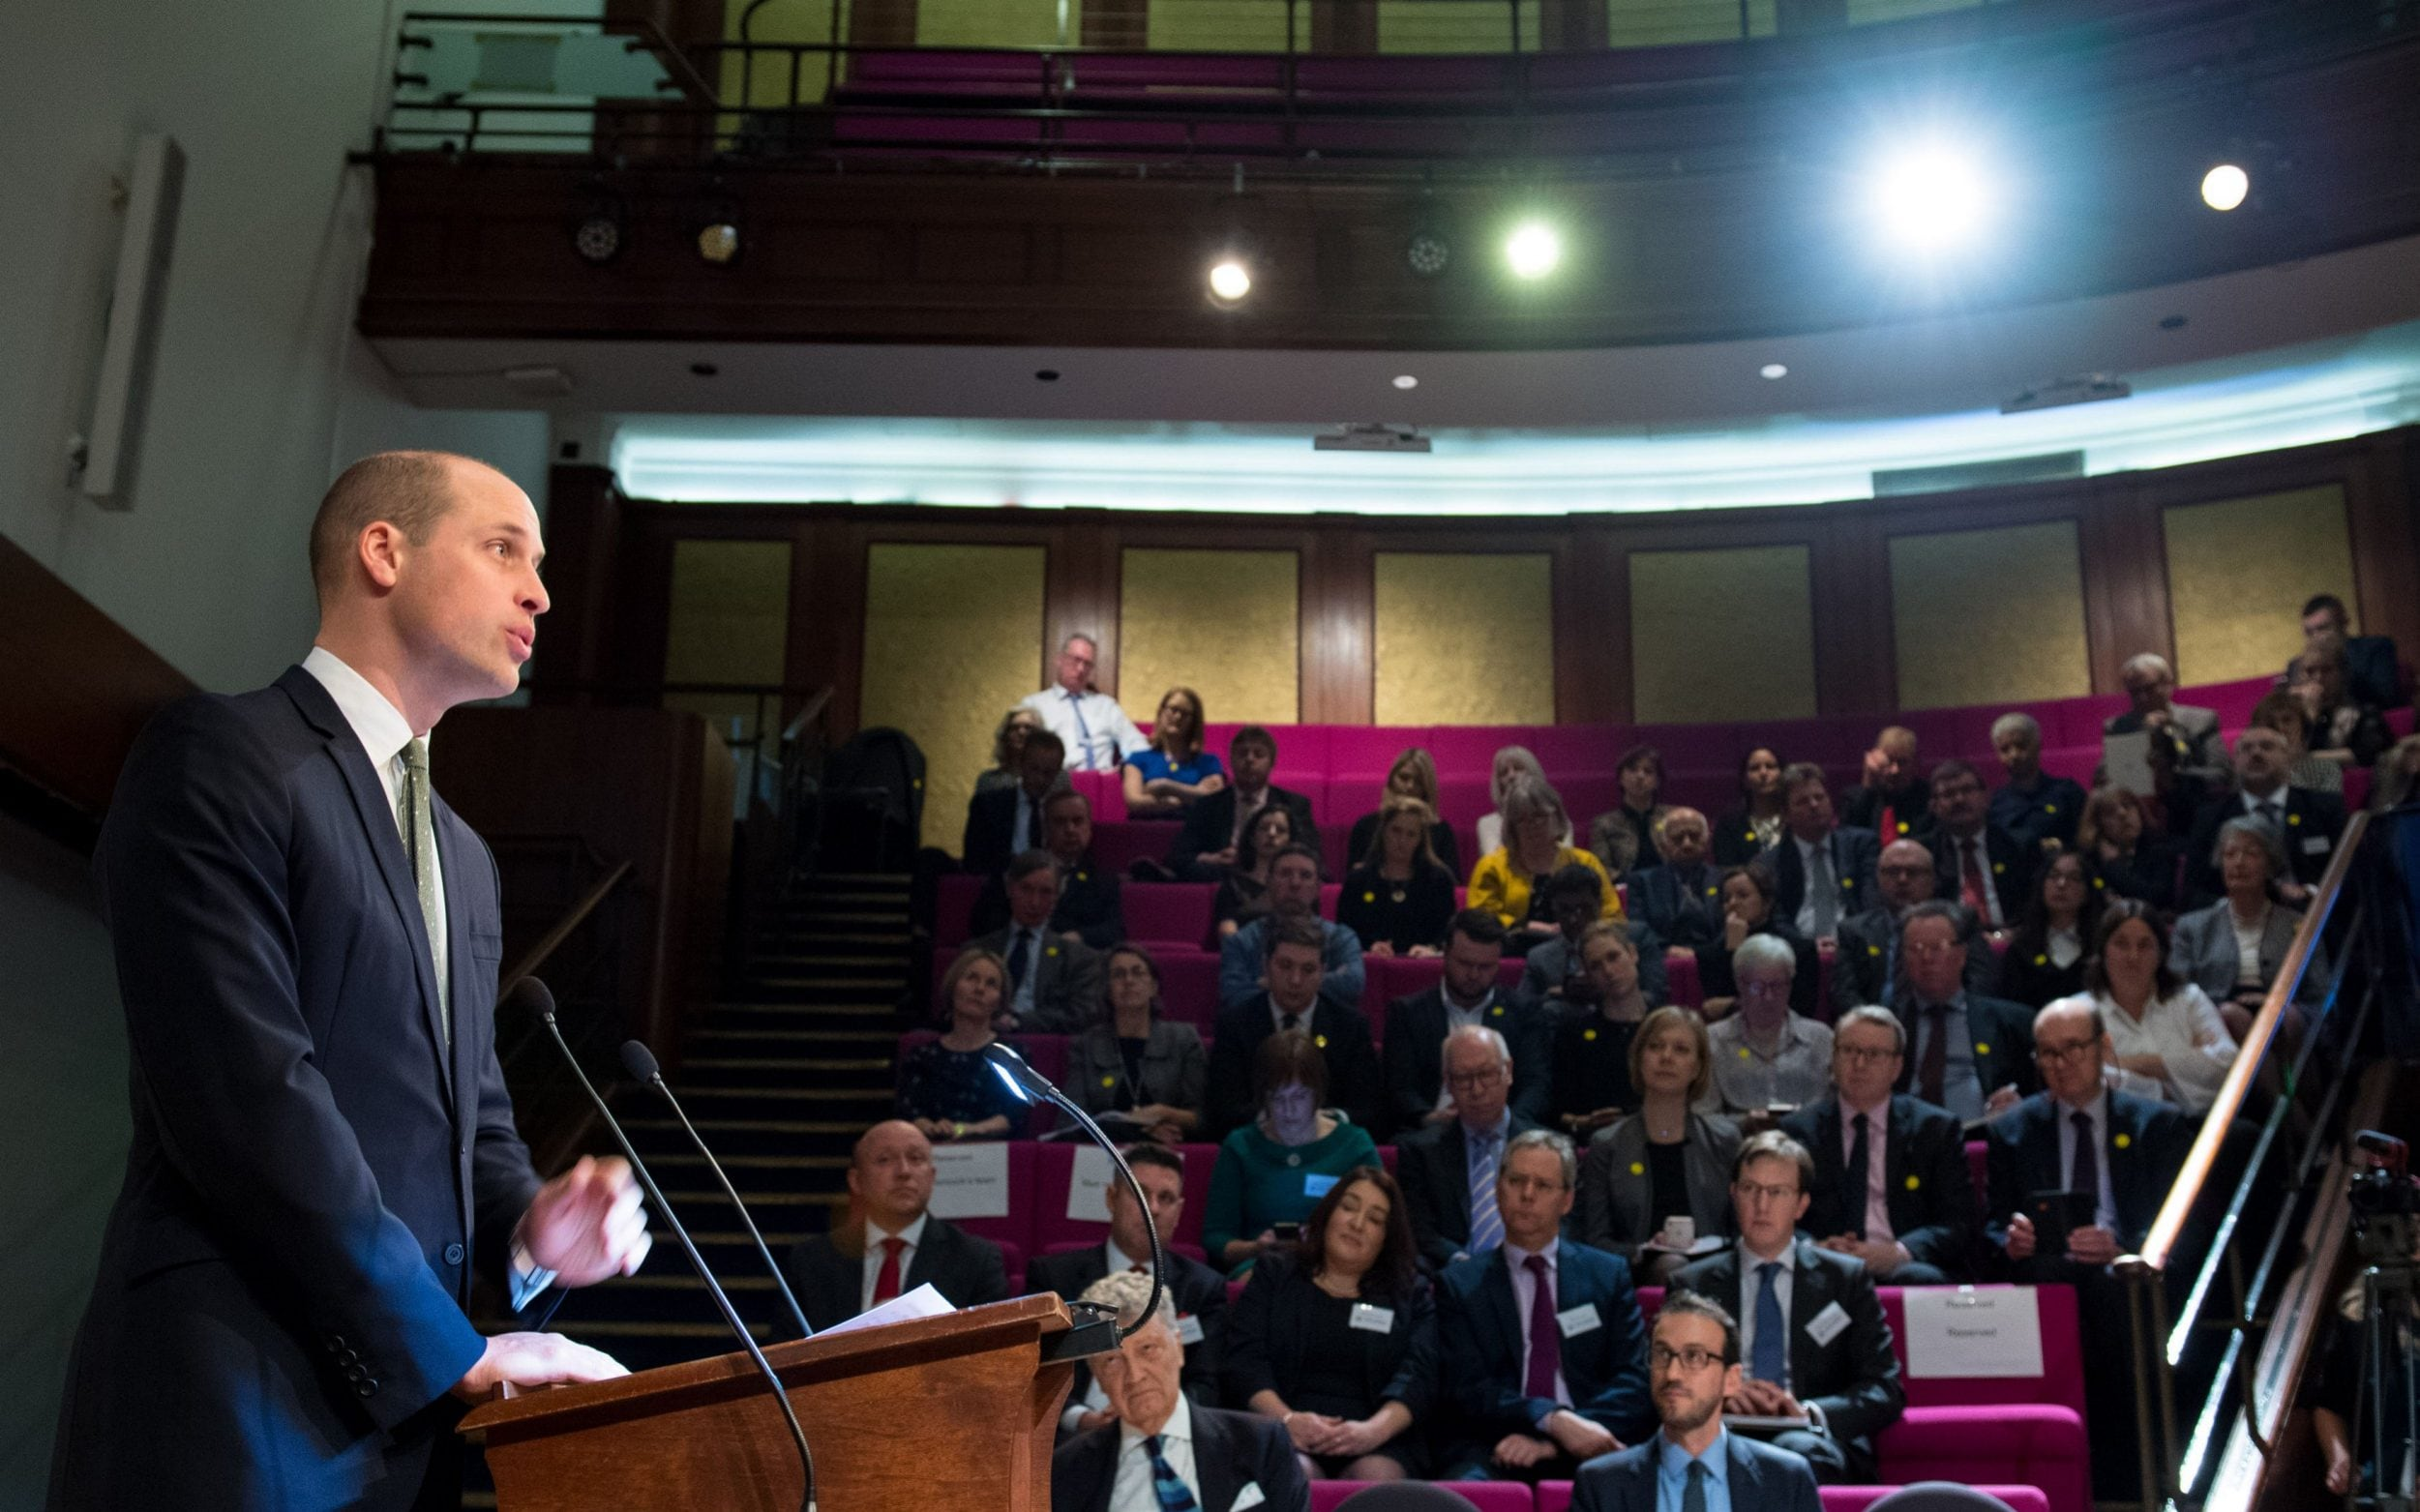 The Duke of Cambridge speaks to charity leaders